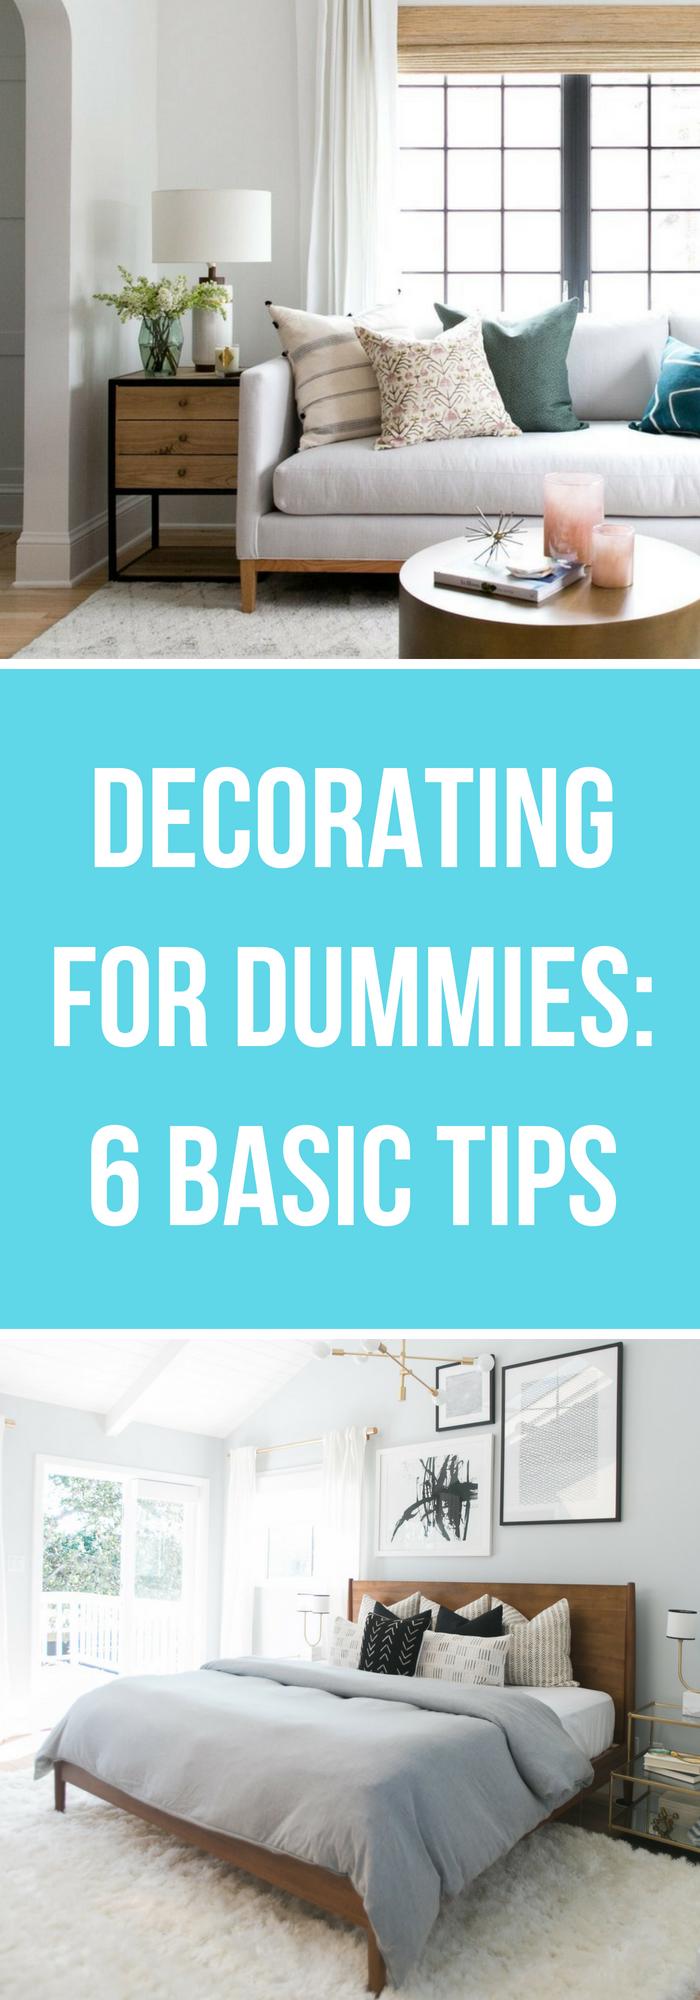 Decorating for dummies basic house tips the organized mom also interior design decor rh pinterest